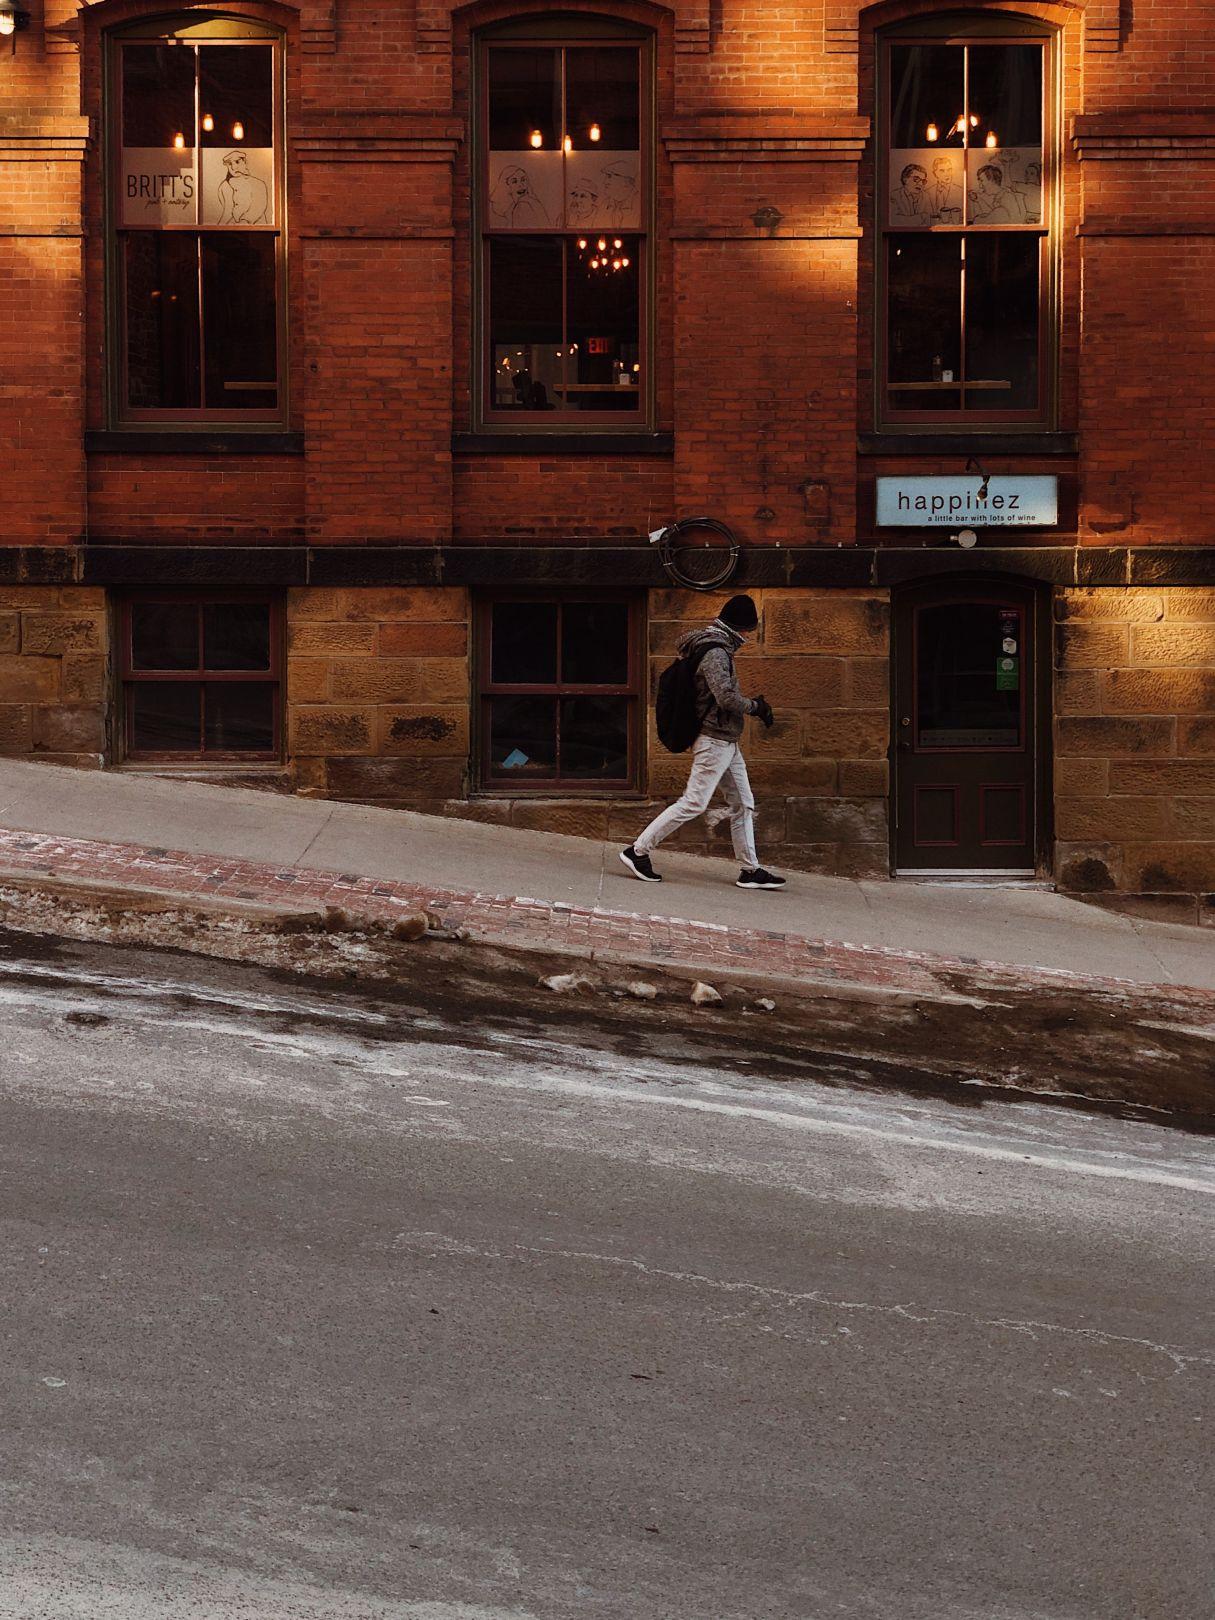 A photo of Man walks by Happinez Bar